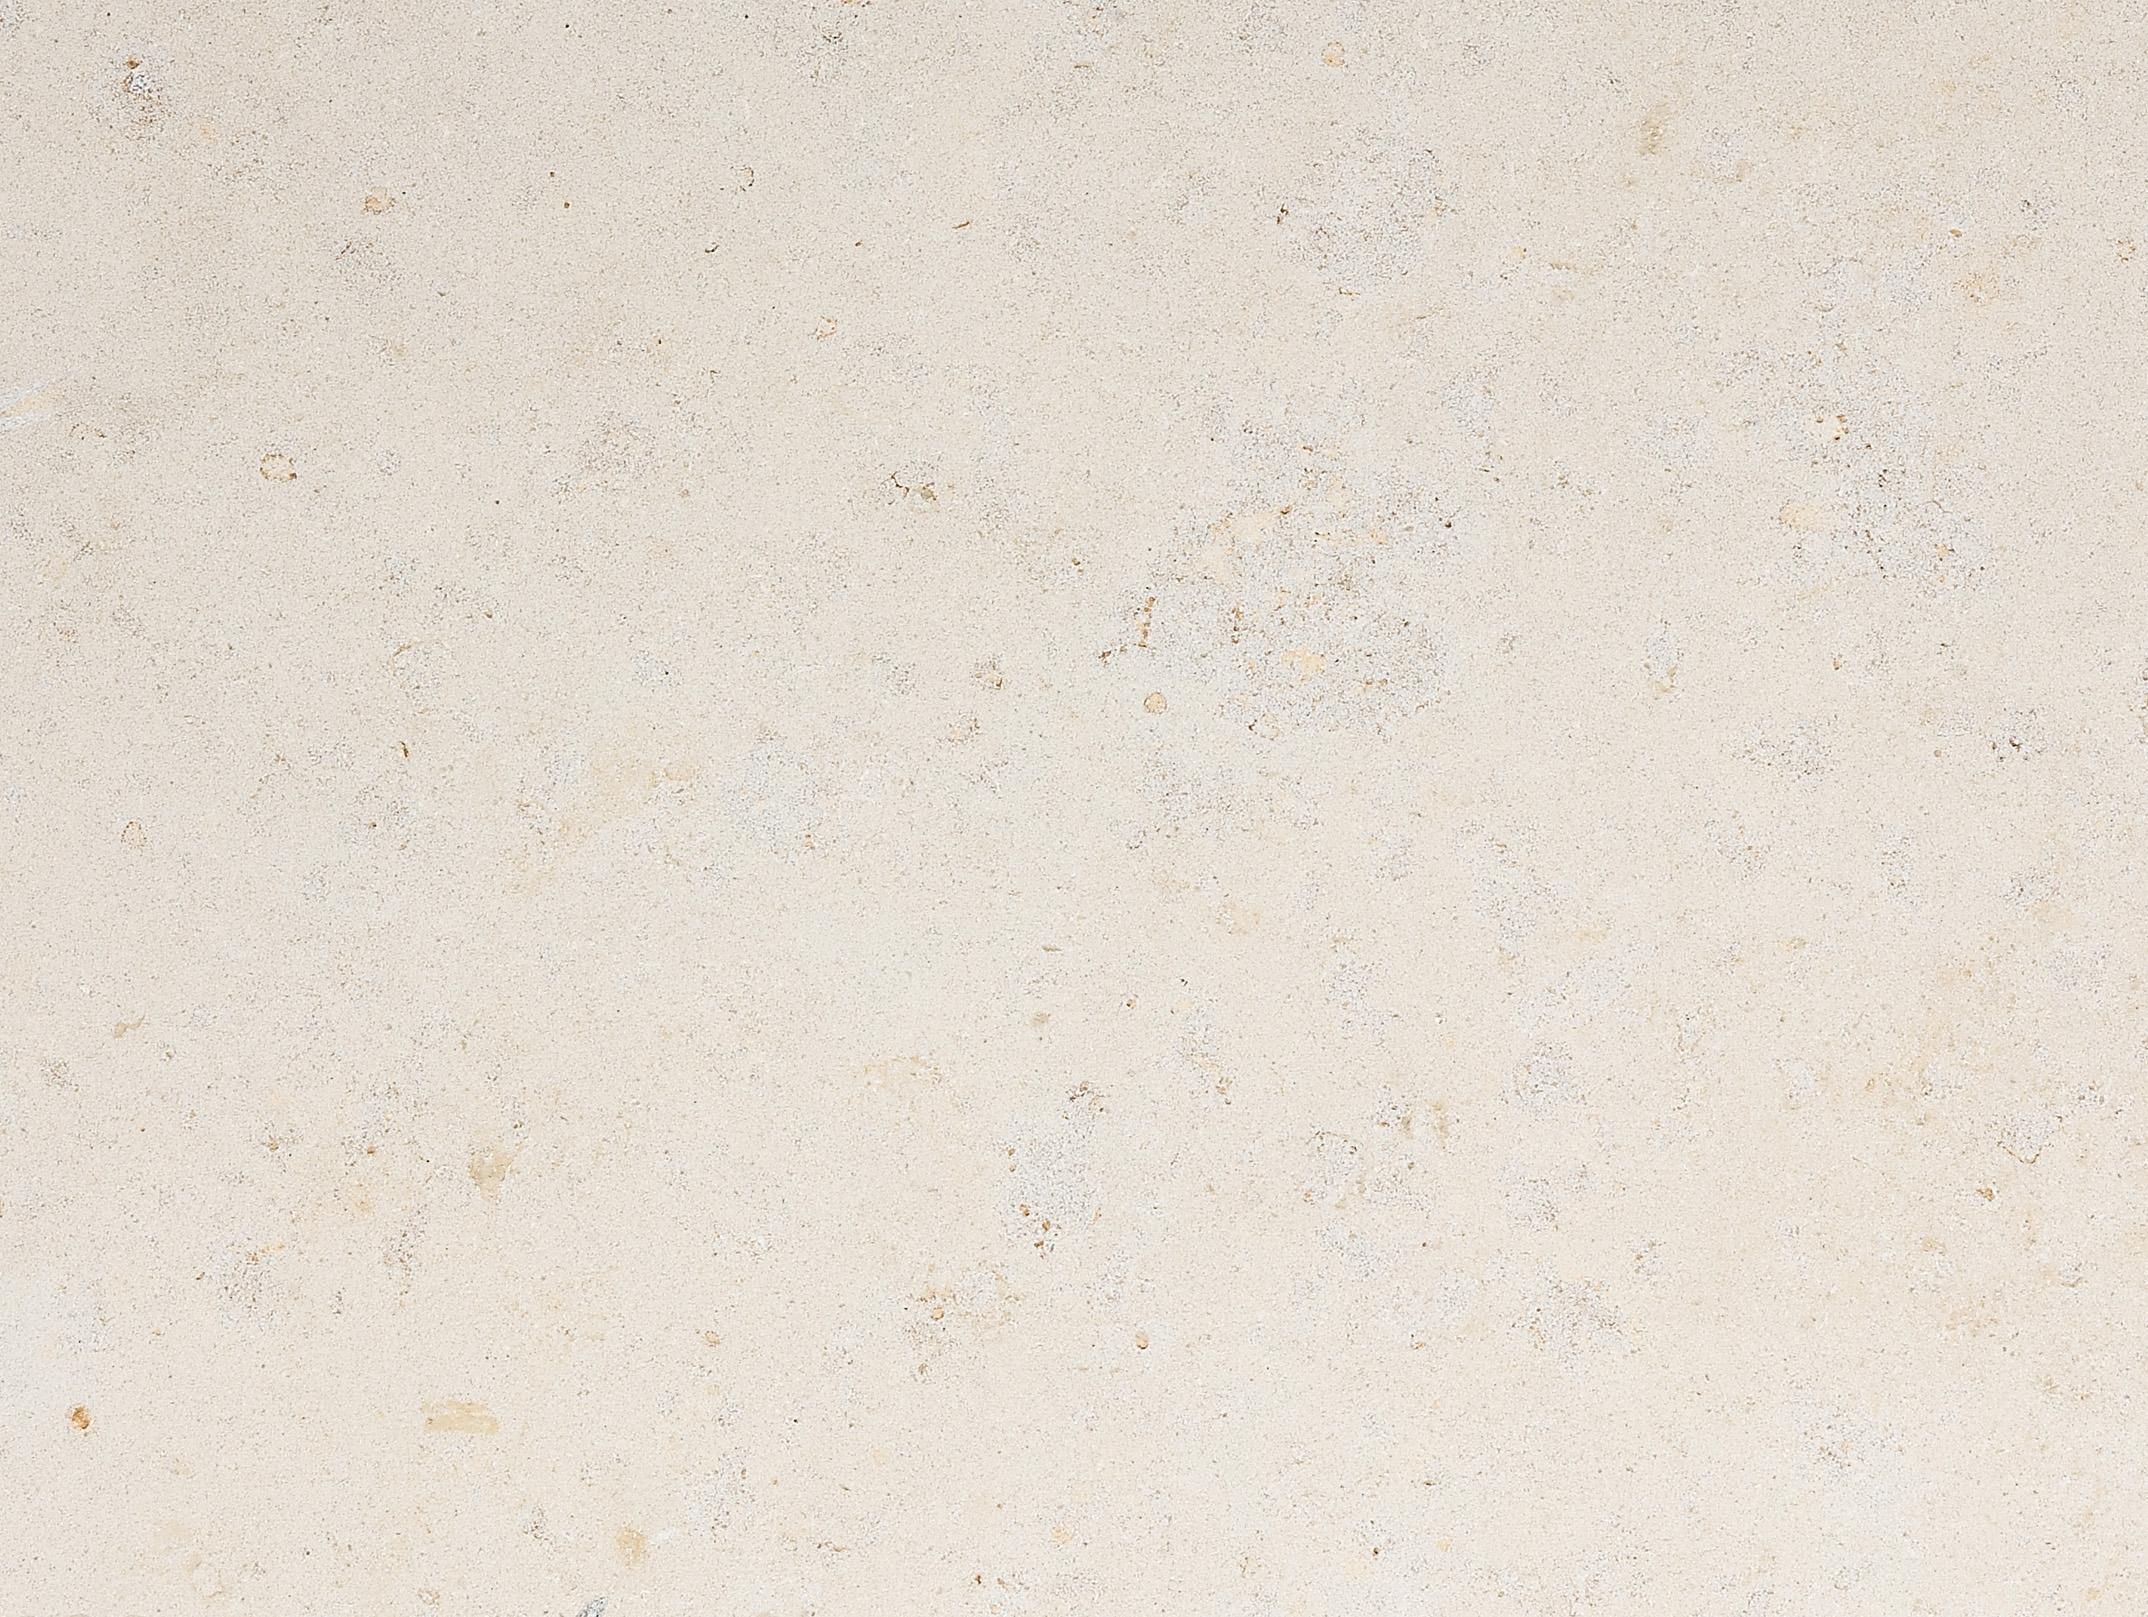 jura dietfurt beige blasted limestone stonedetailpage hofmann naturstein. Black Bedroom Furniture Sets. Home Design Ideas